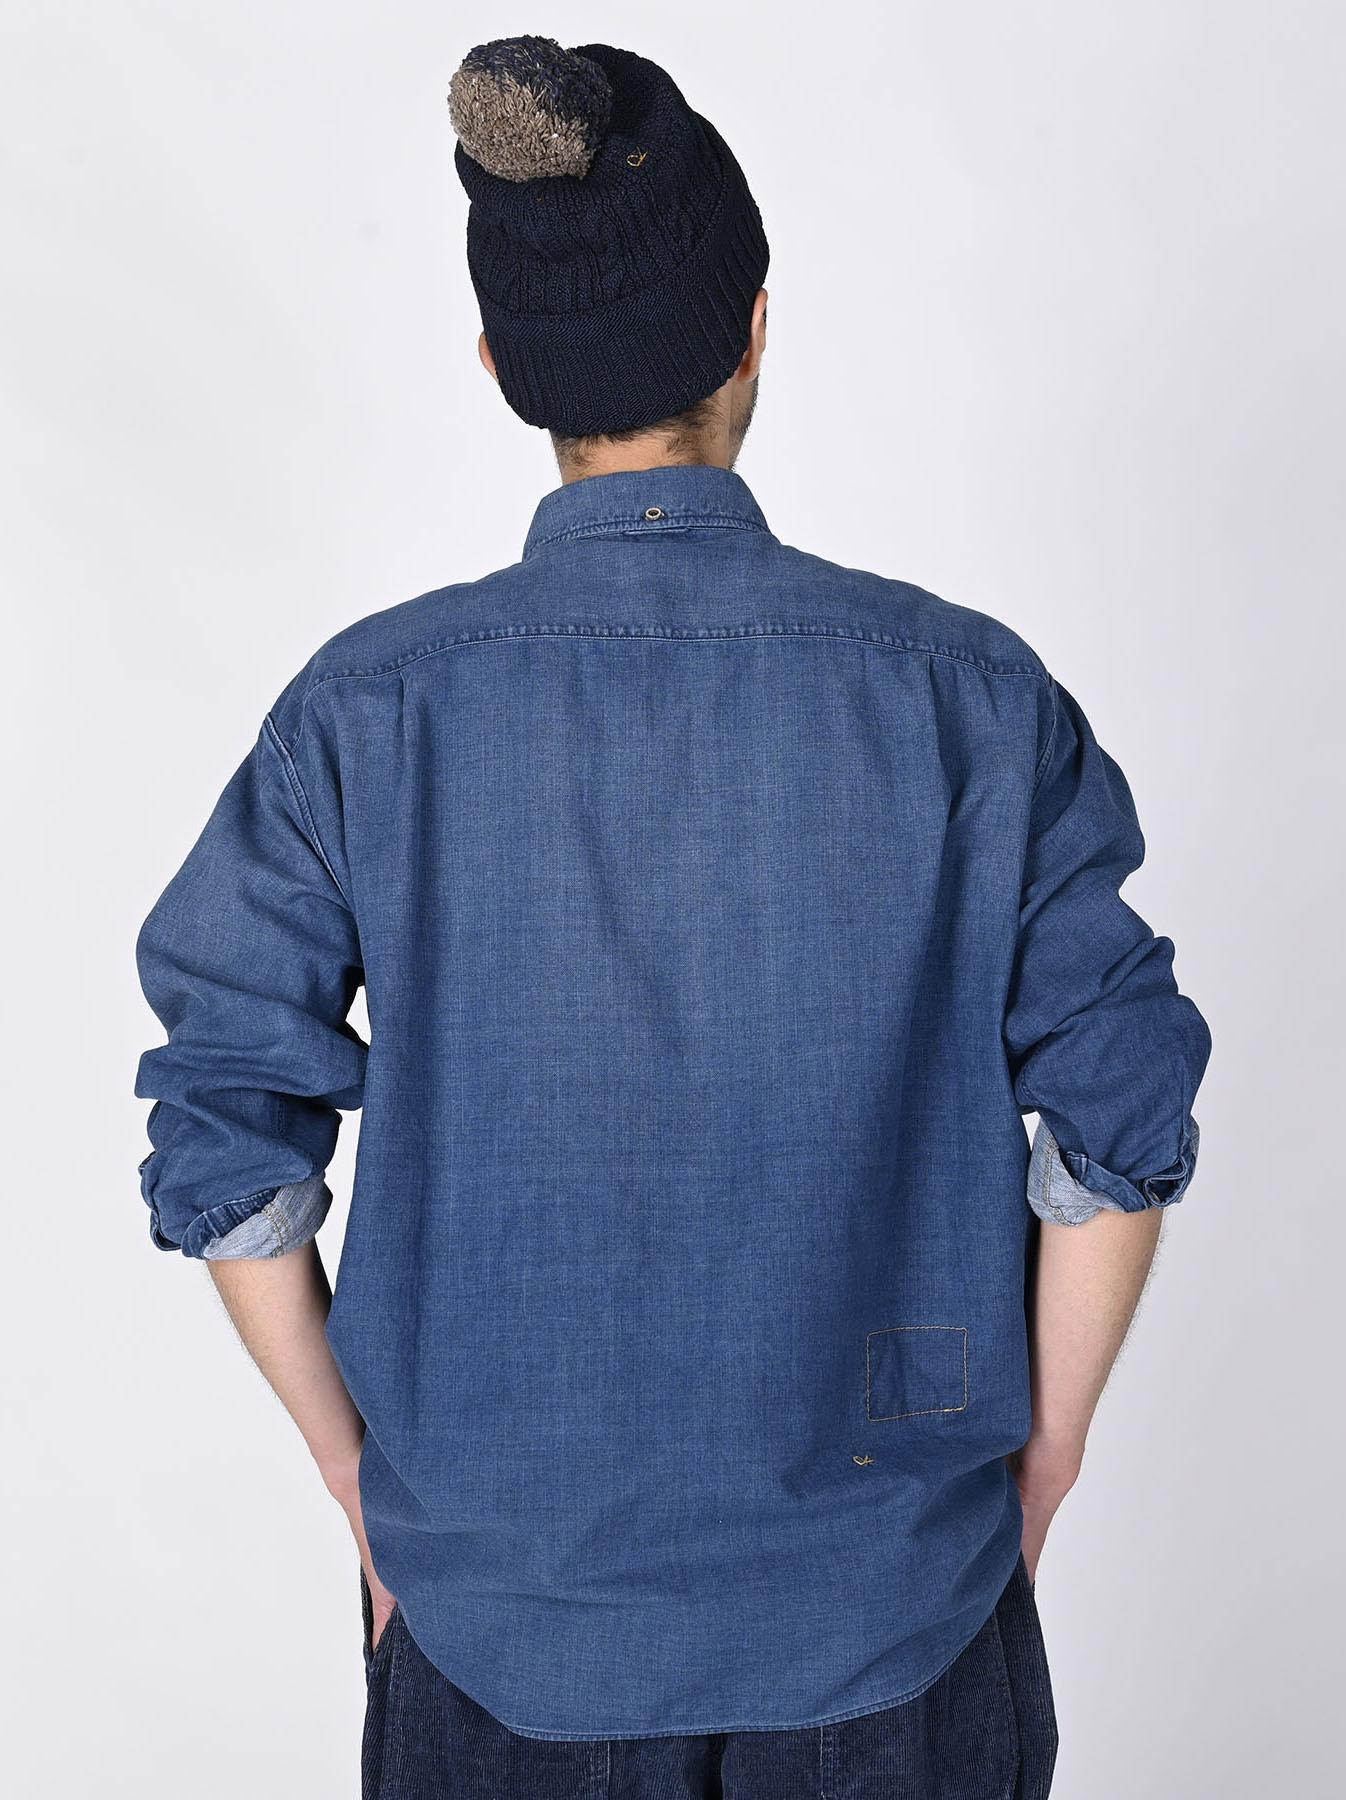 Indigo Gauze 908 Ocean Shirt Distressed-4